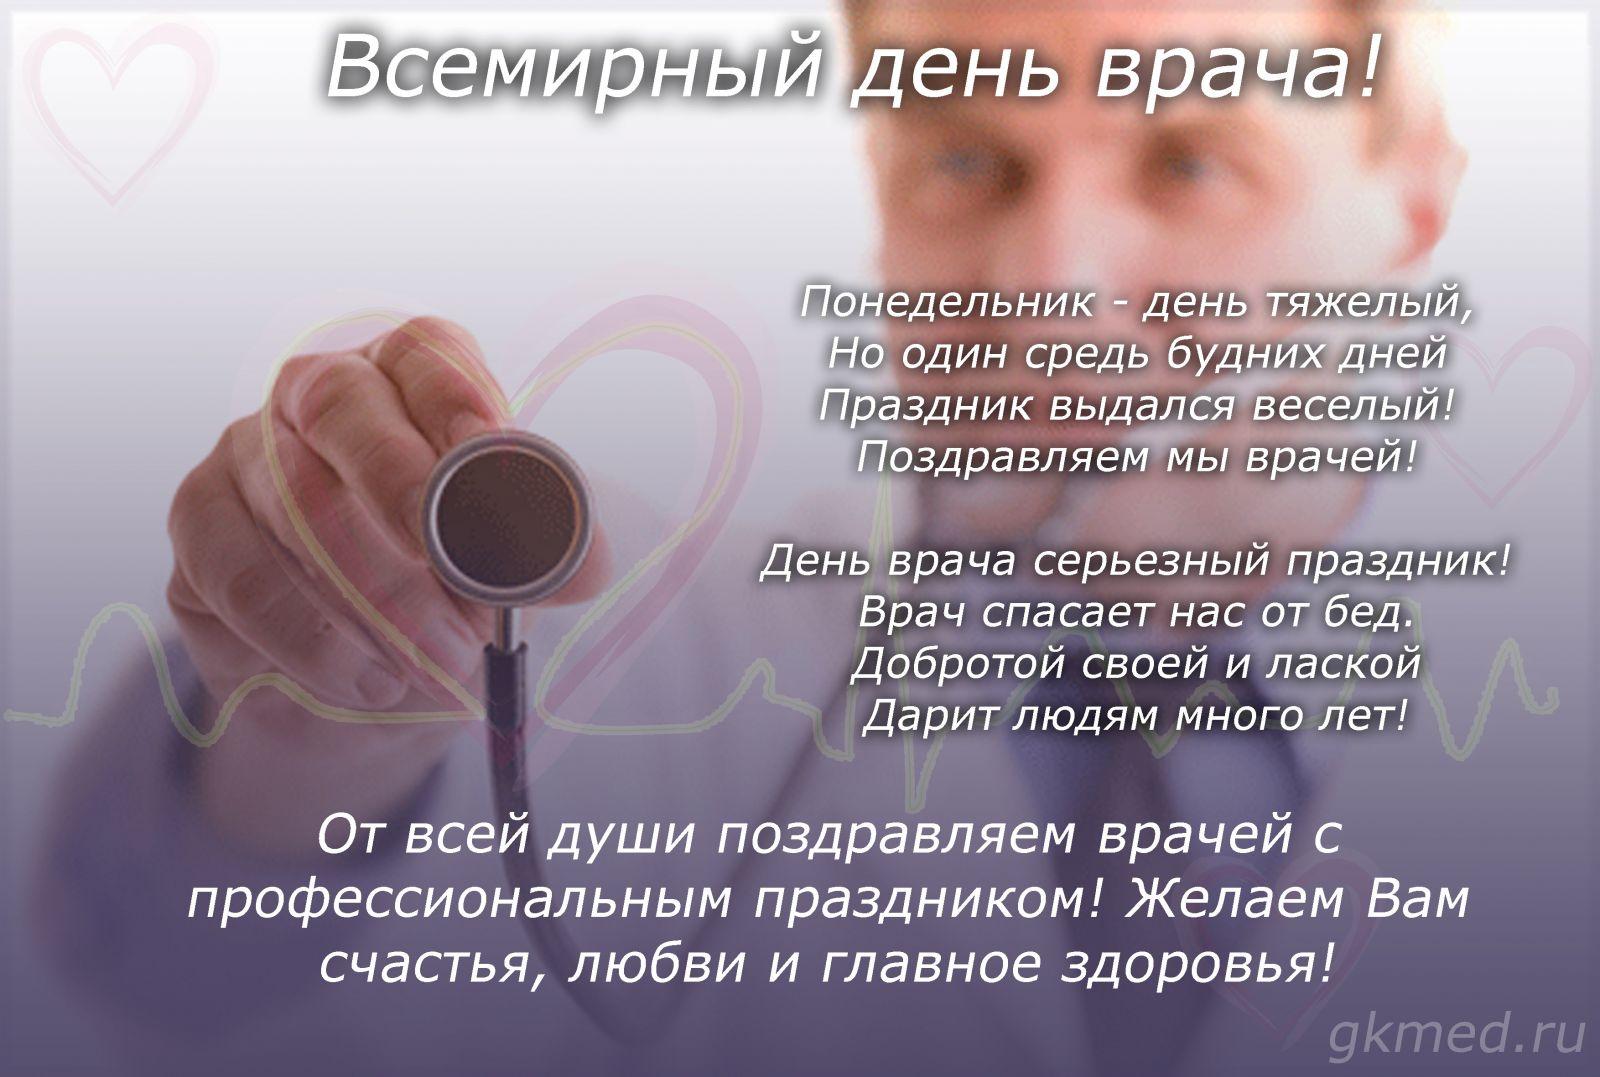 Поздравления врача фтизиатра 85